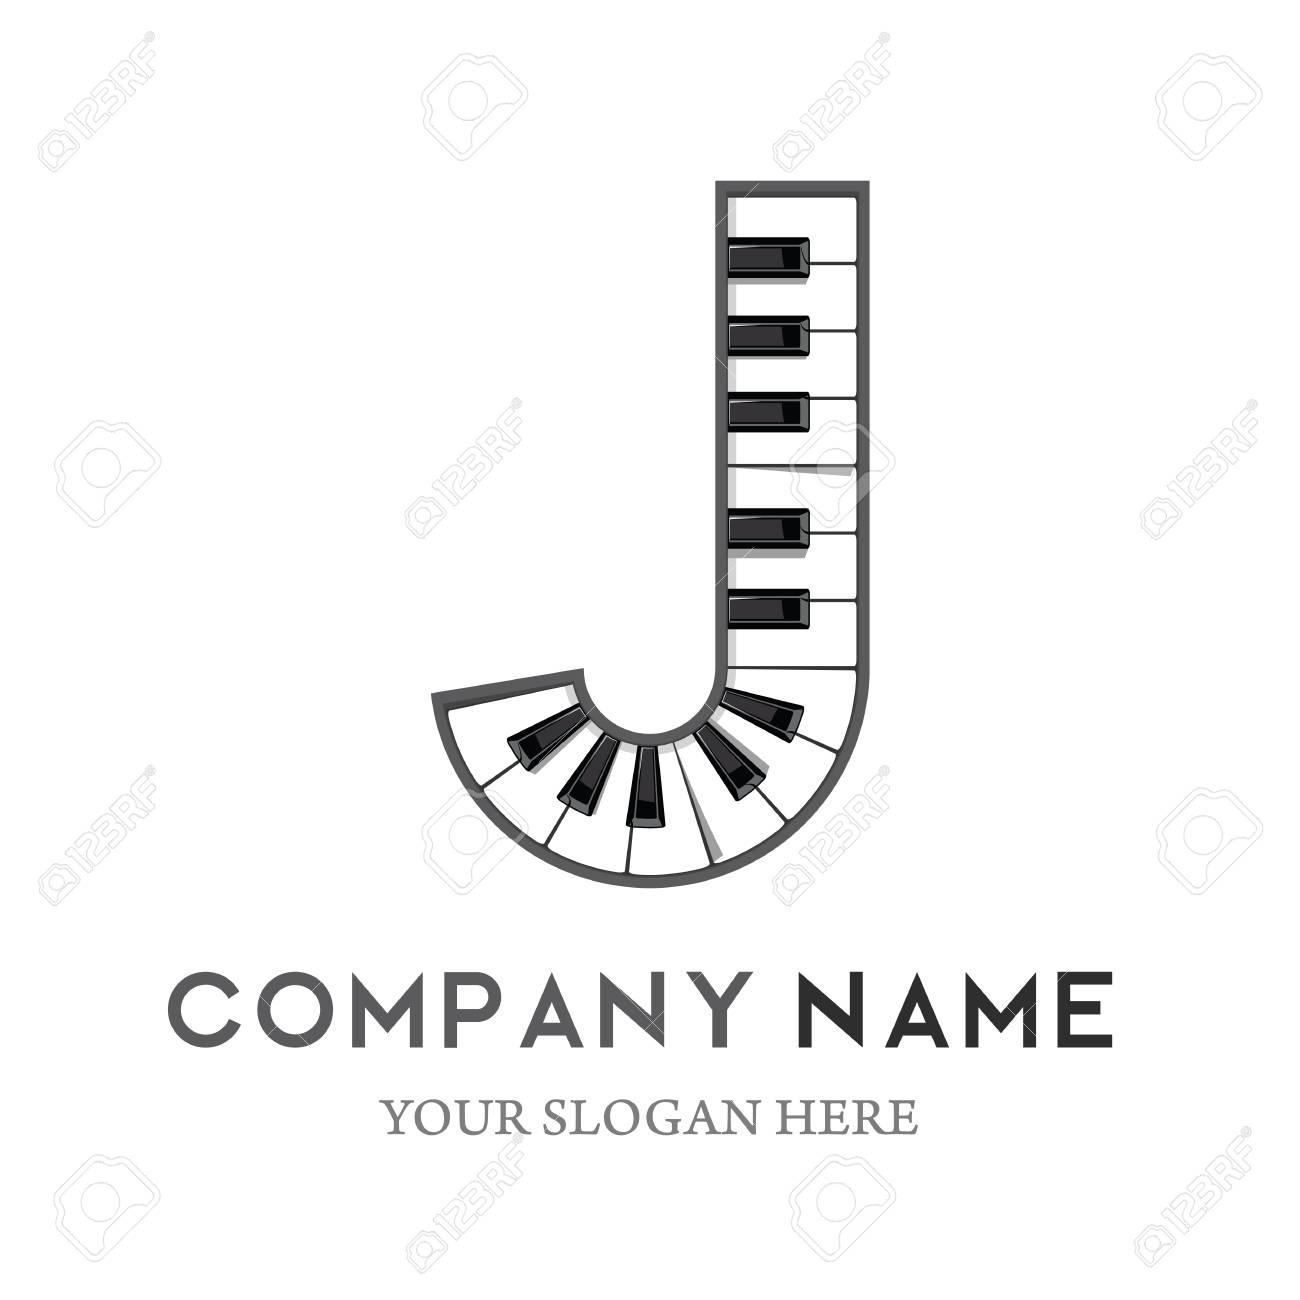 J Letter Logo Design Piano keyboard logo. Music icon design template. vector illustration. - 106187514